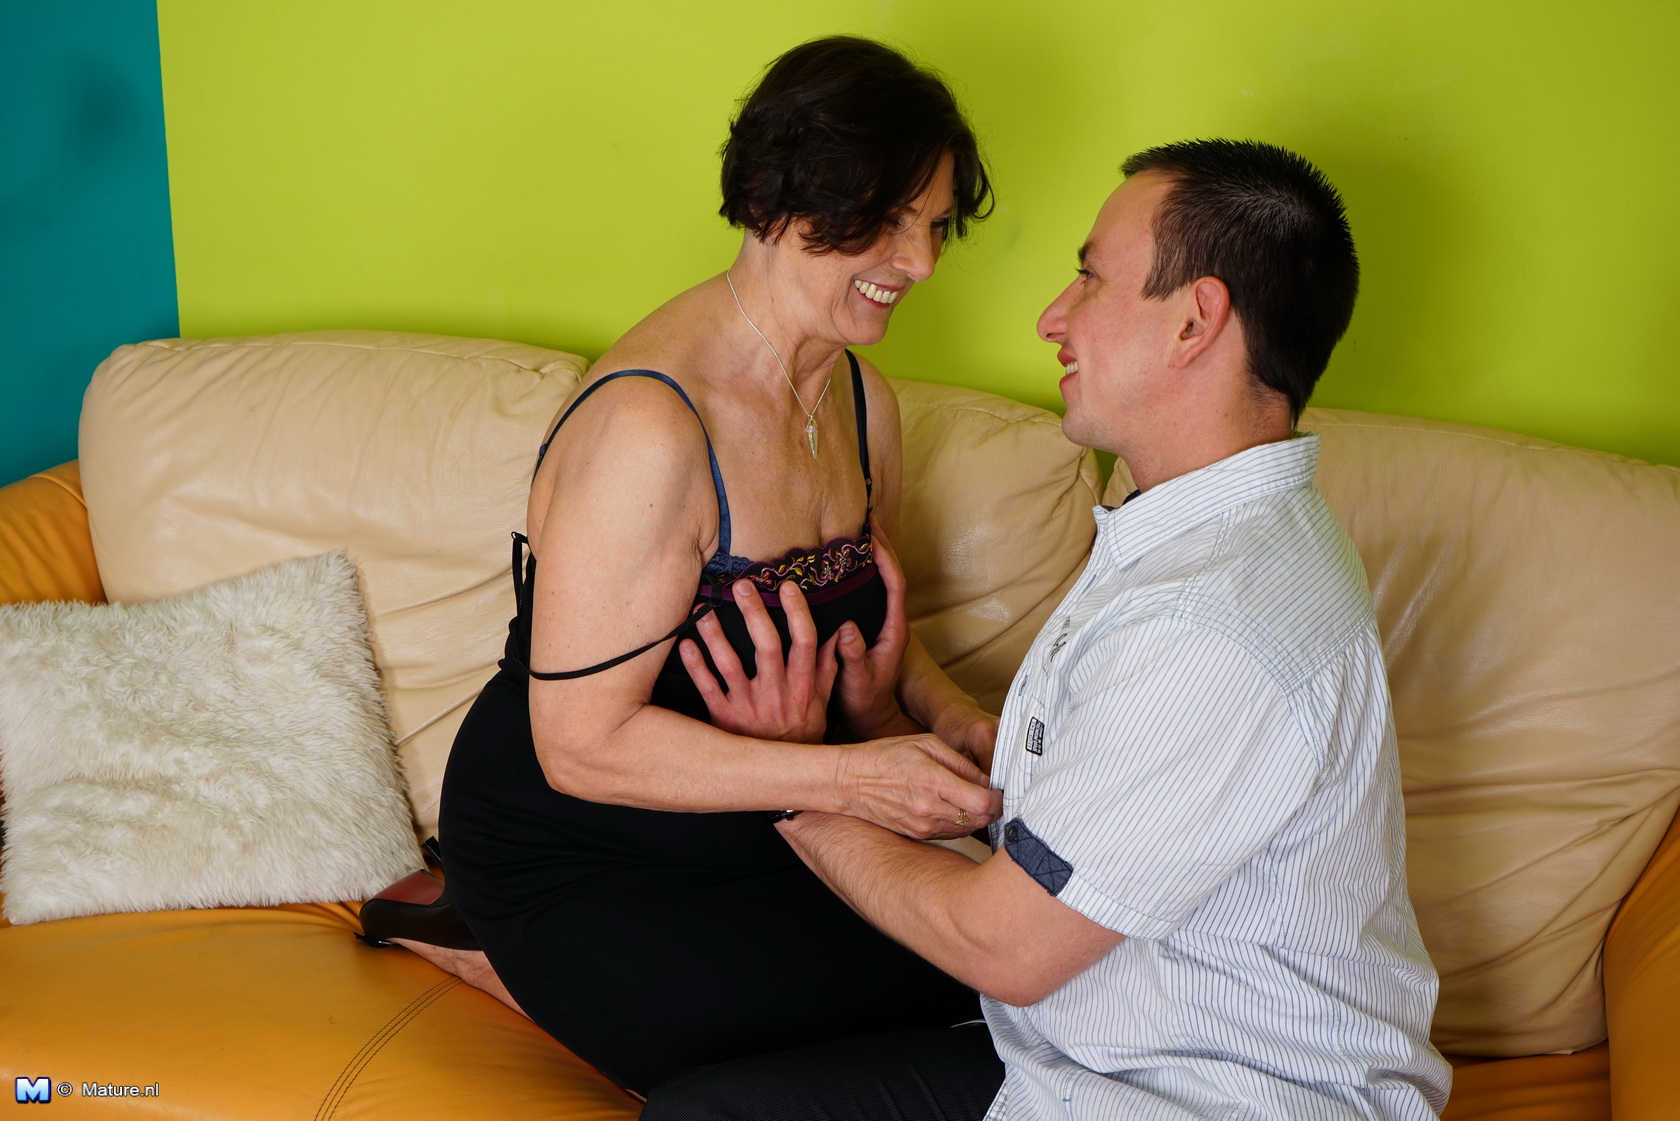 horny women getting laid